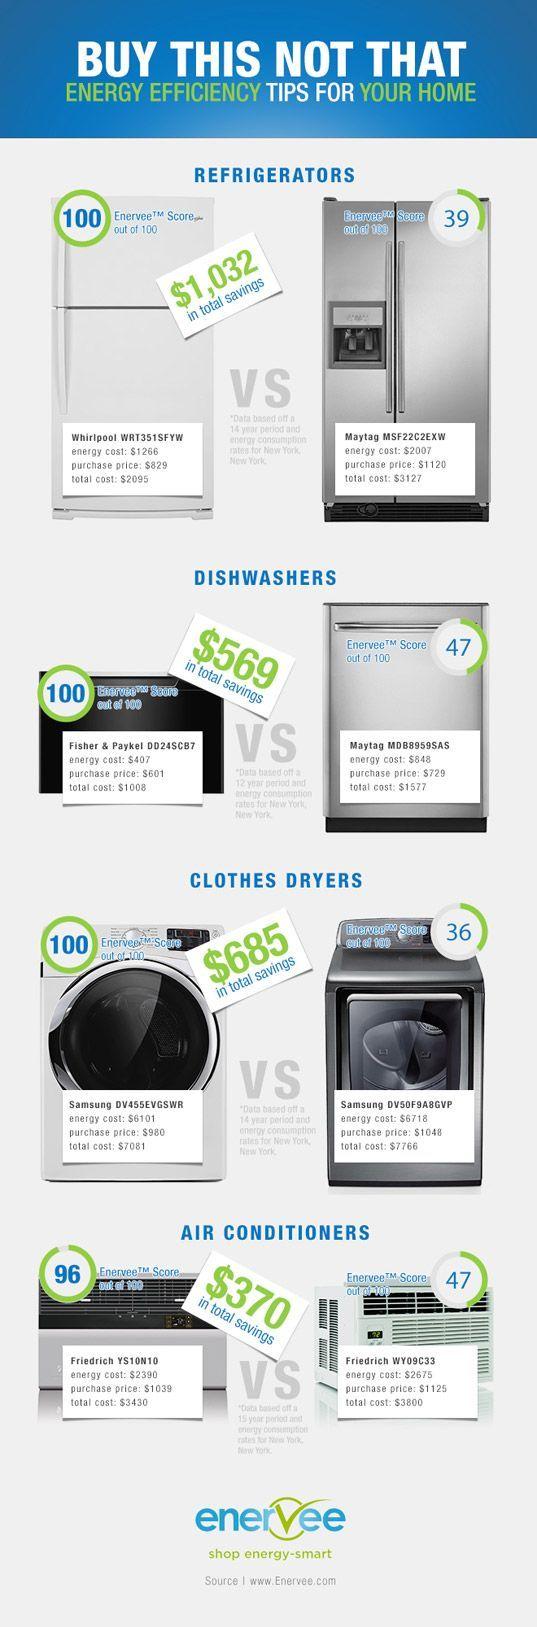 Enervee, energy efficiency, home appliances, green appliances, green design, sustainable design, efficient refrigerator, efficient dishwashe... #greenenergy